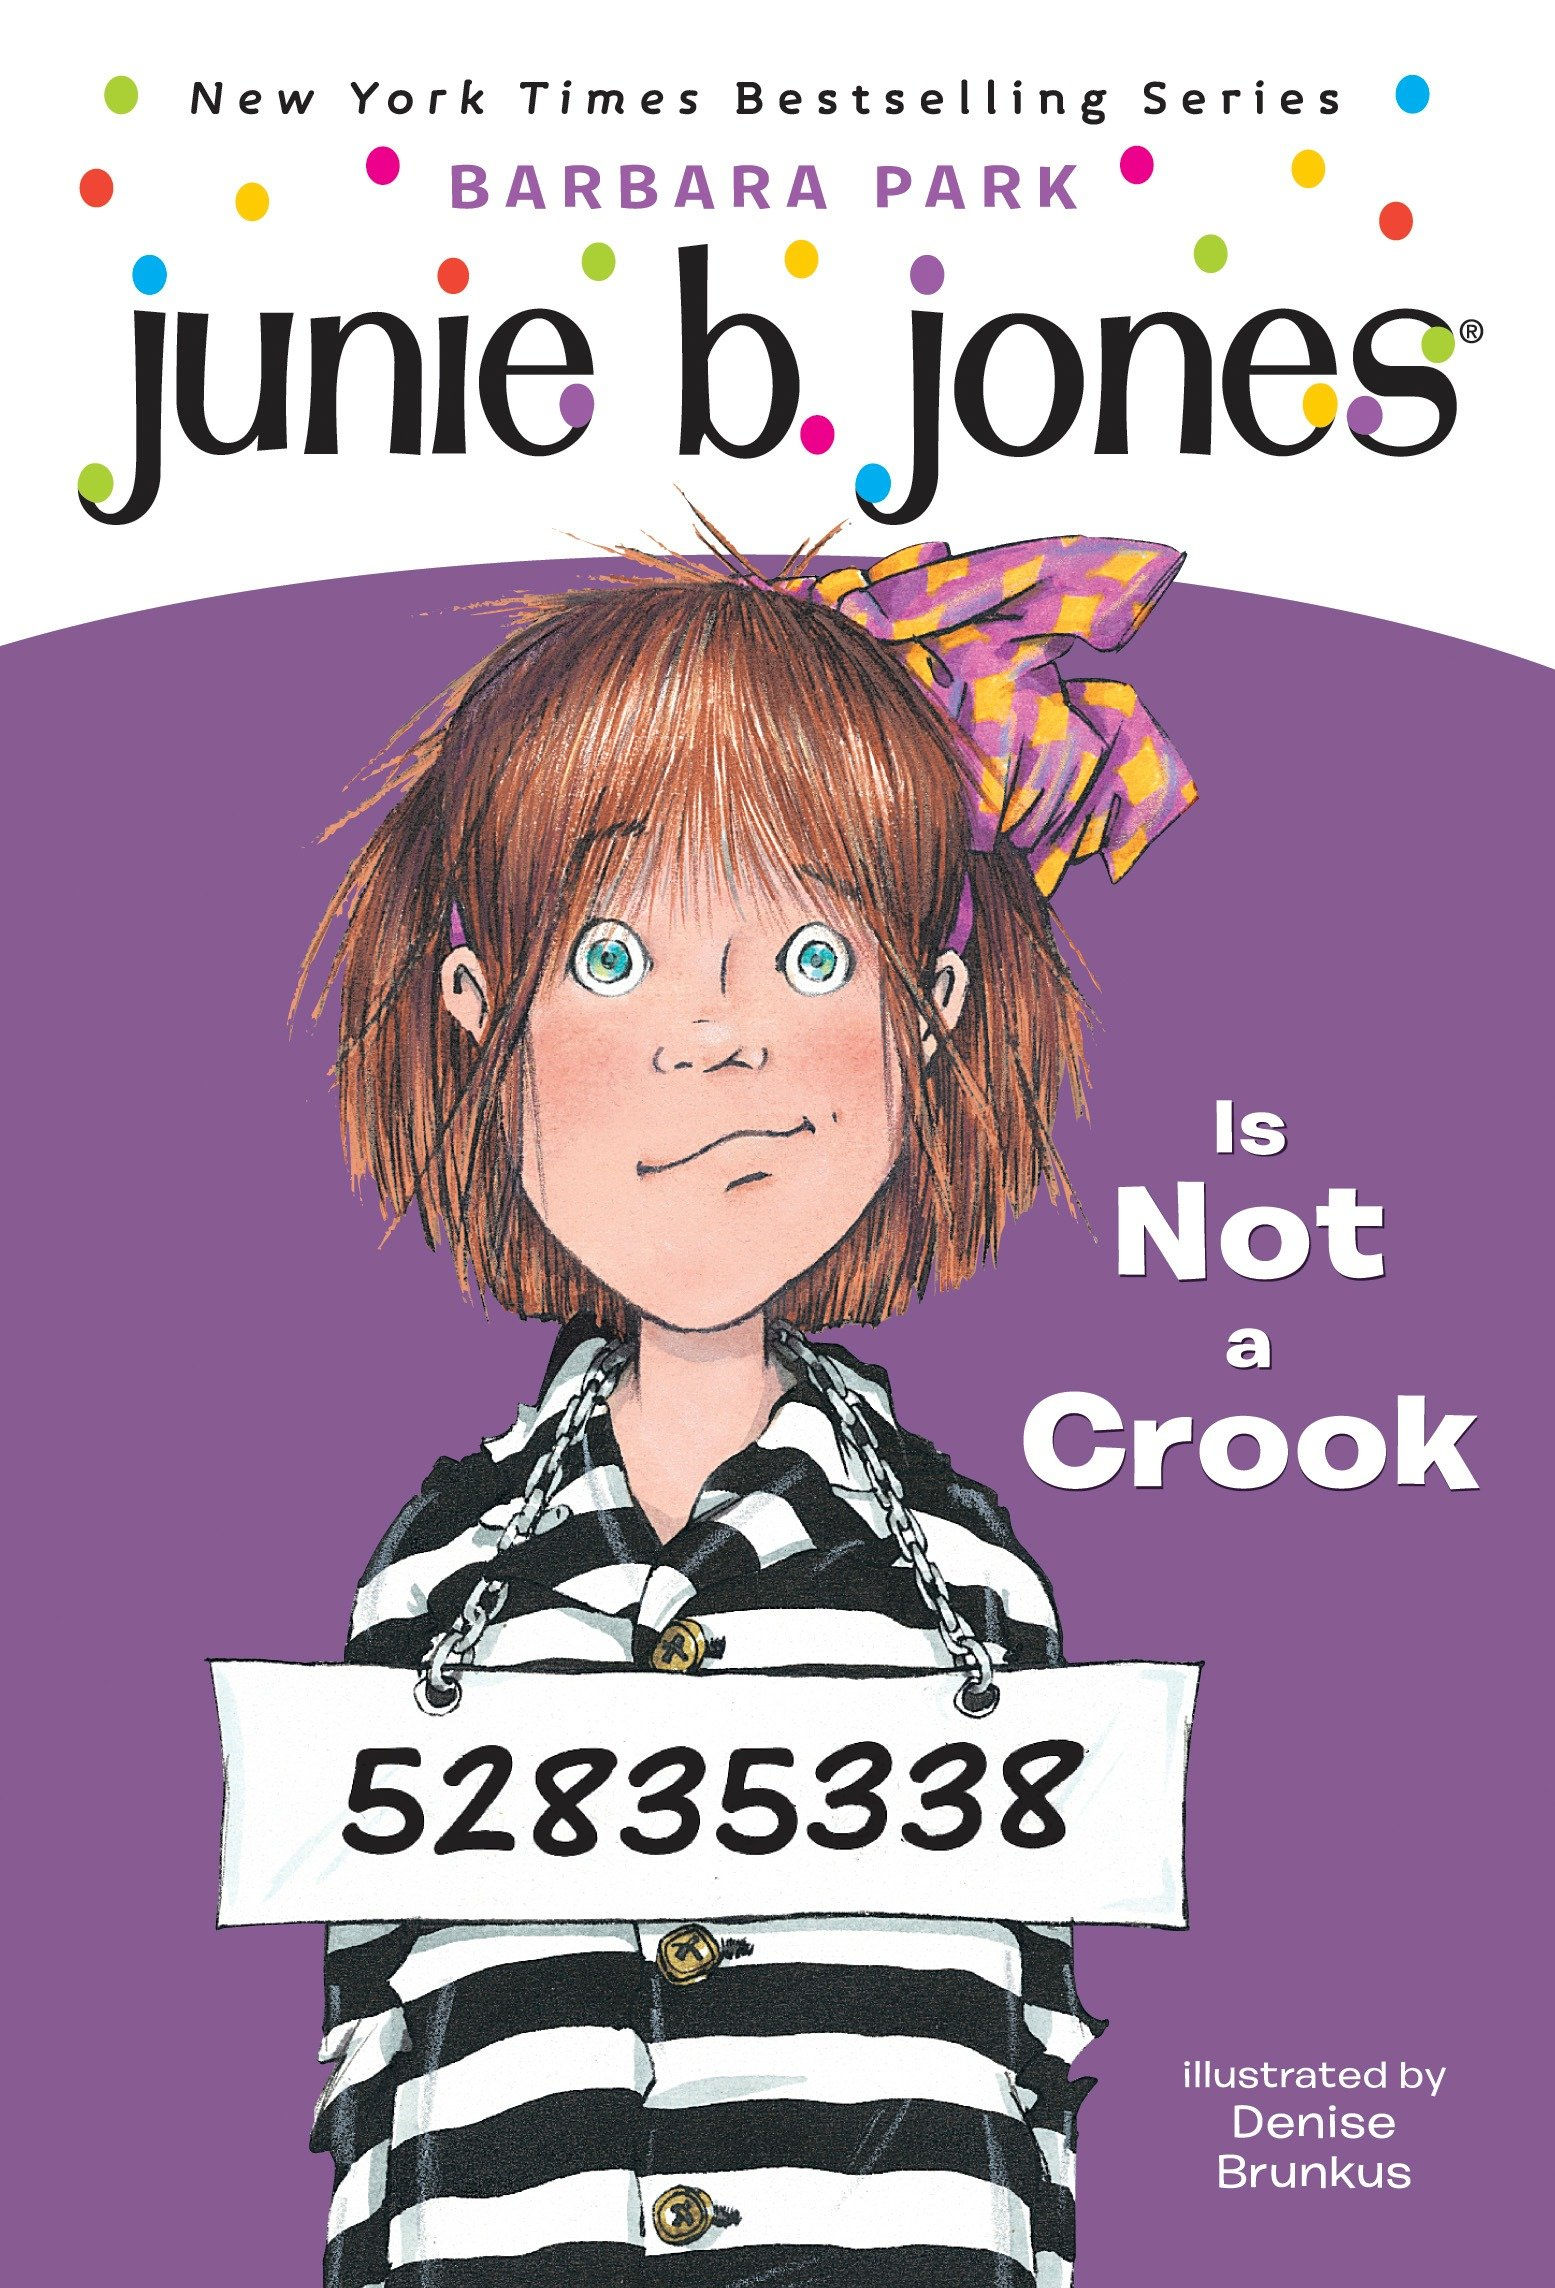 Junie B. Jones Is Not a Crook cover image